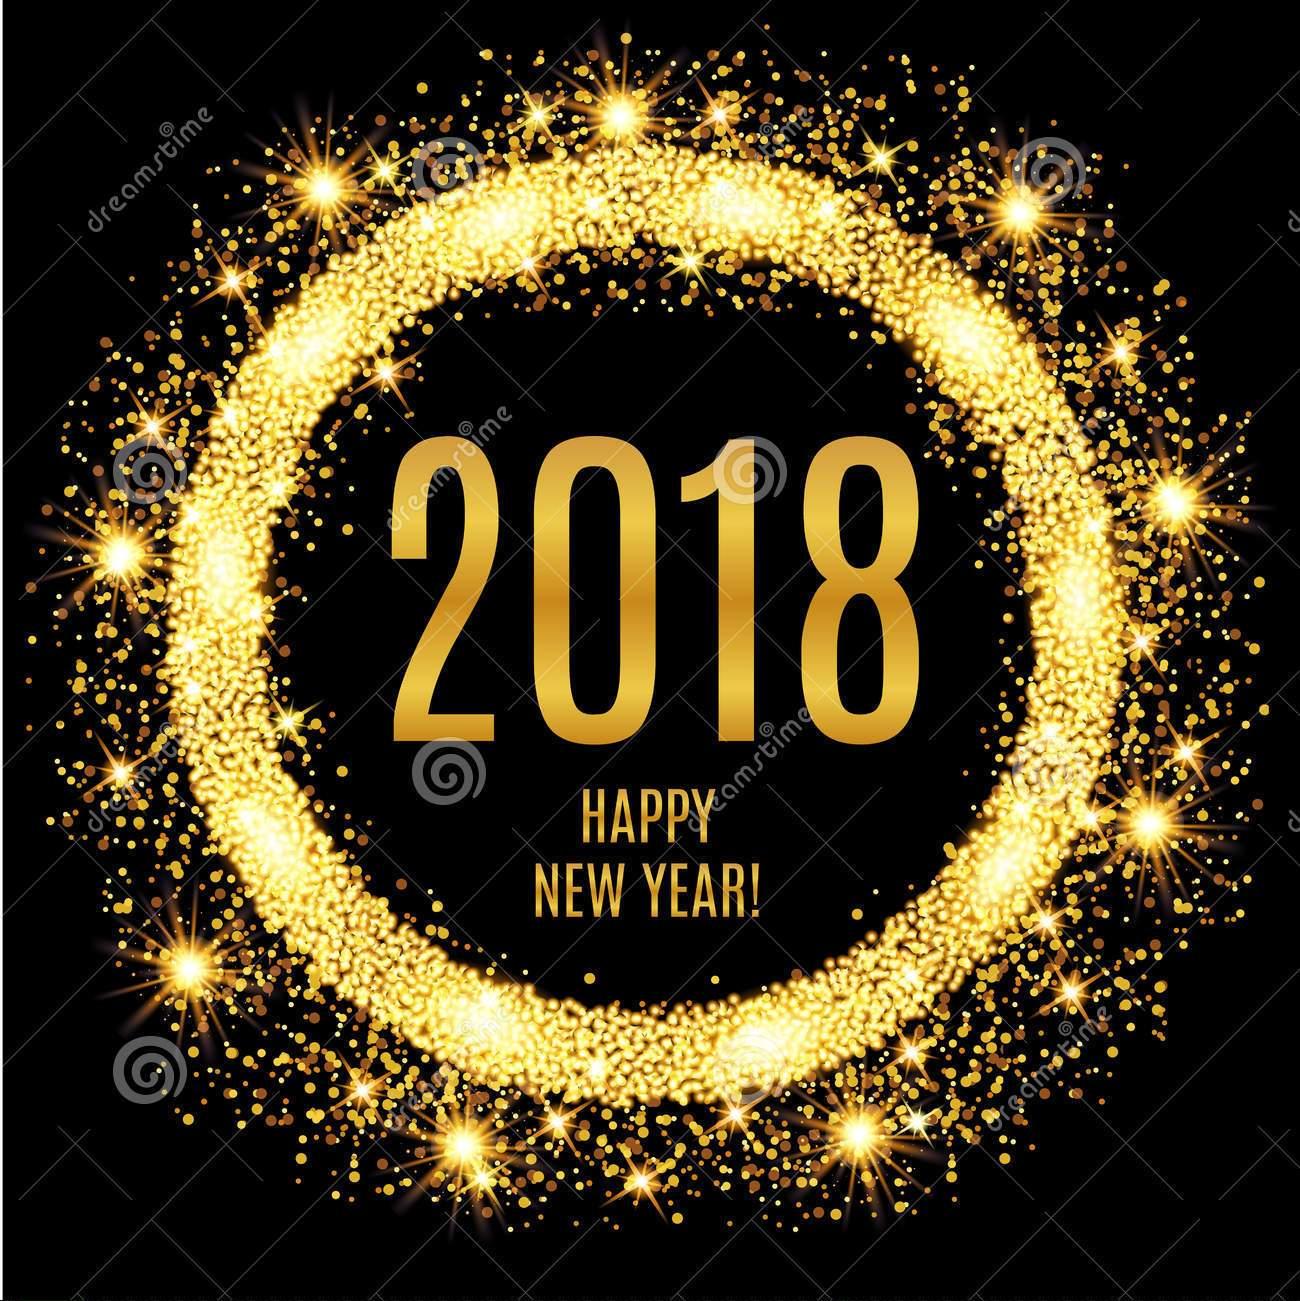 Waheguru ji Free Happy New Year 2018 HD Wallpapers for Computer & Phone